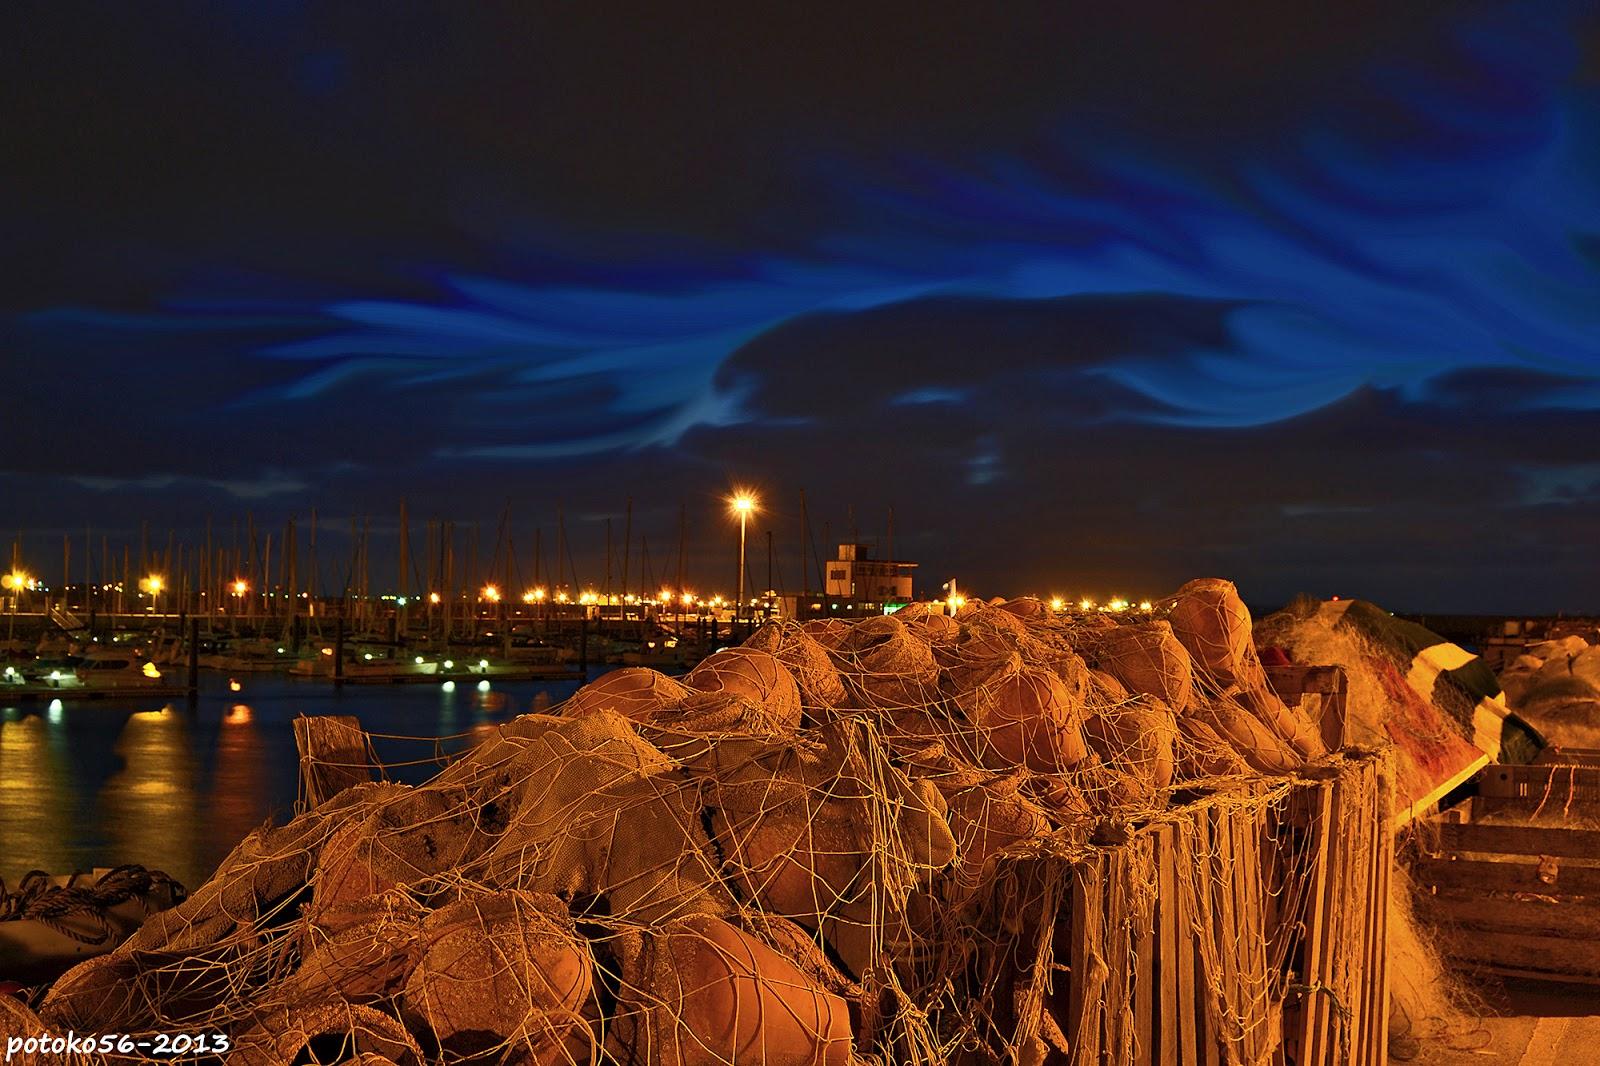 Muelle de Rota amanecer con Aurora Boreal